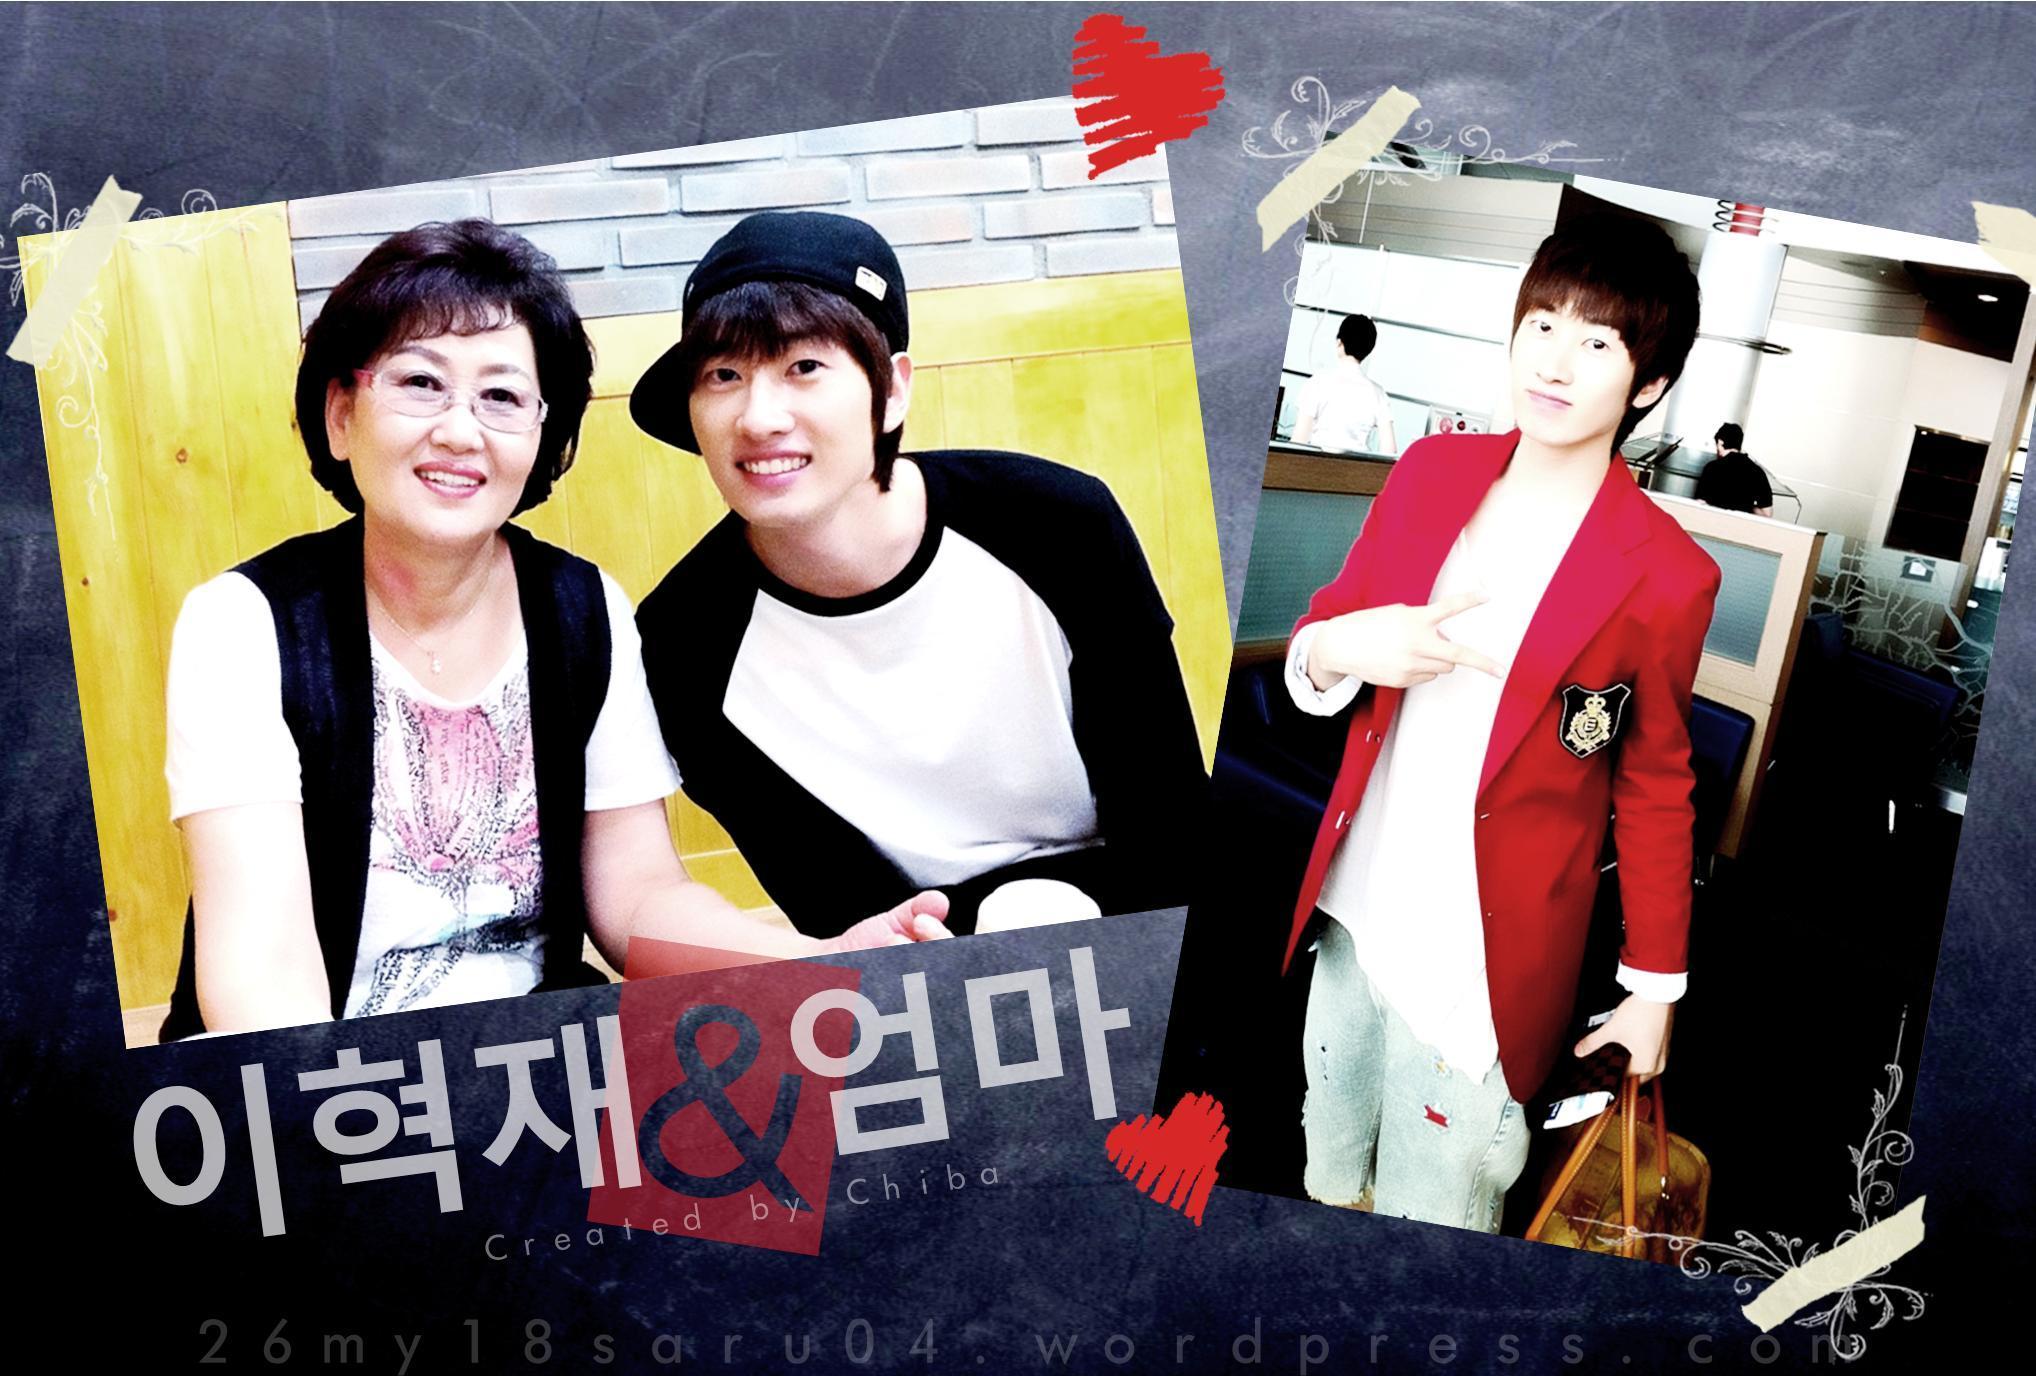 Pic] Eunhyuk Wallpaper by chiba | ~Mr.Simple*in*Beautiful World